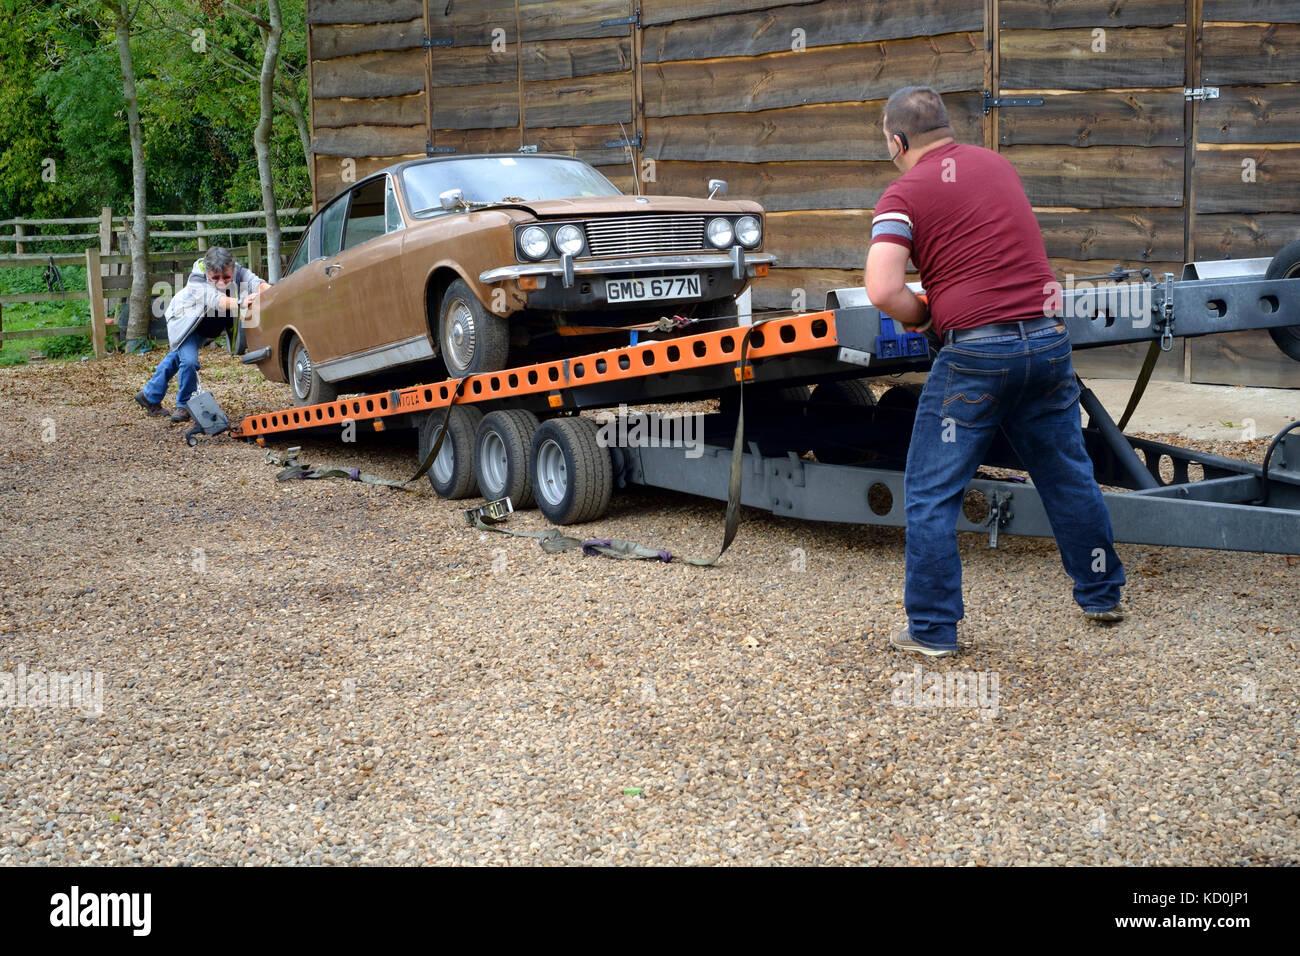 Restorable Classic Car Stock Photos & Restorable Classic Car Stock ...